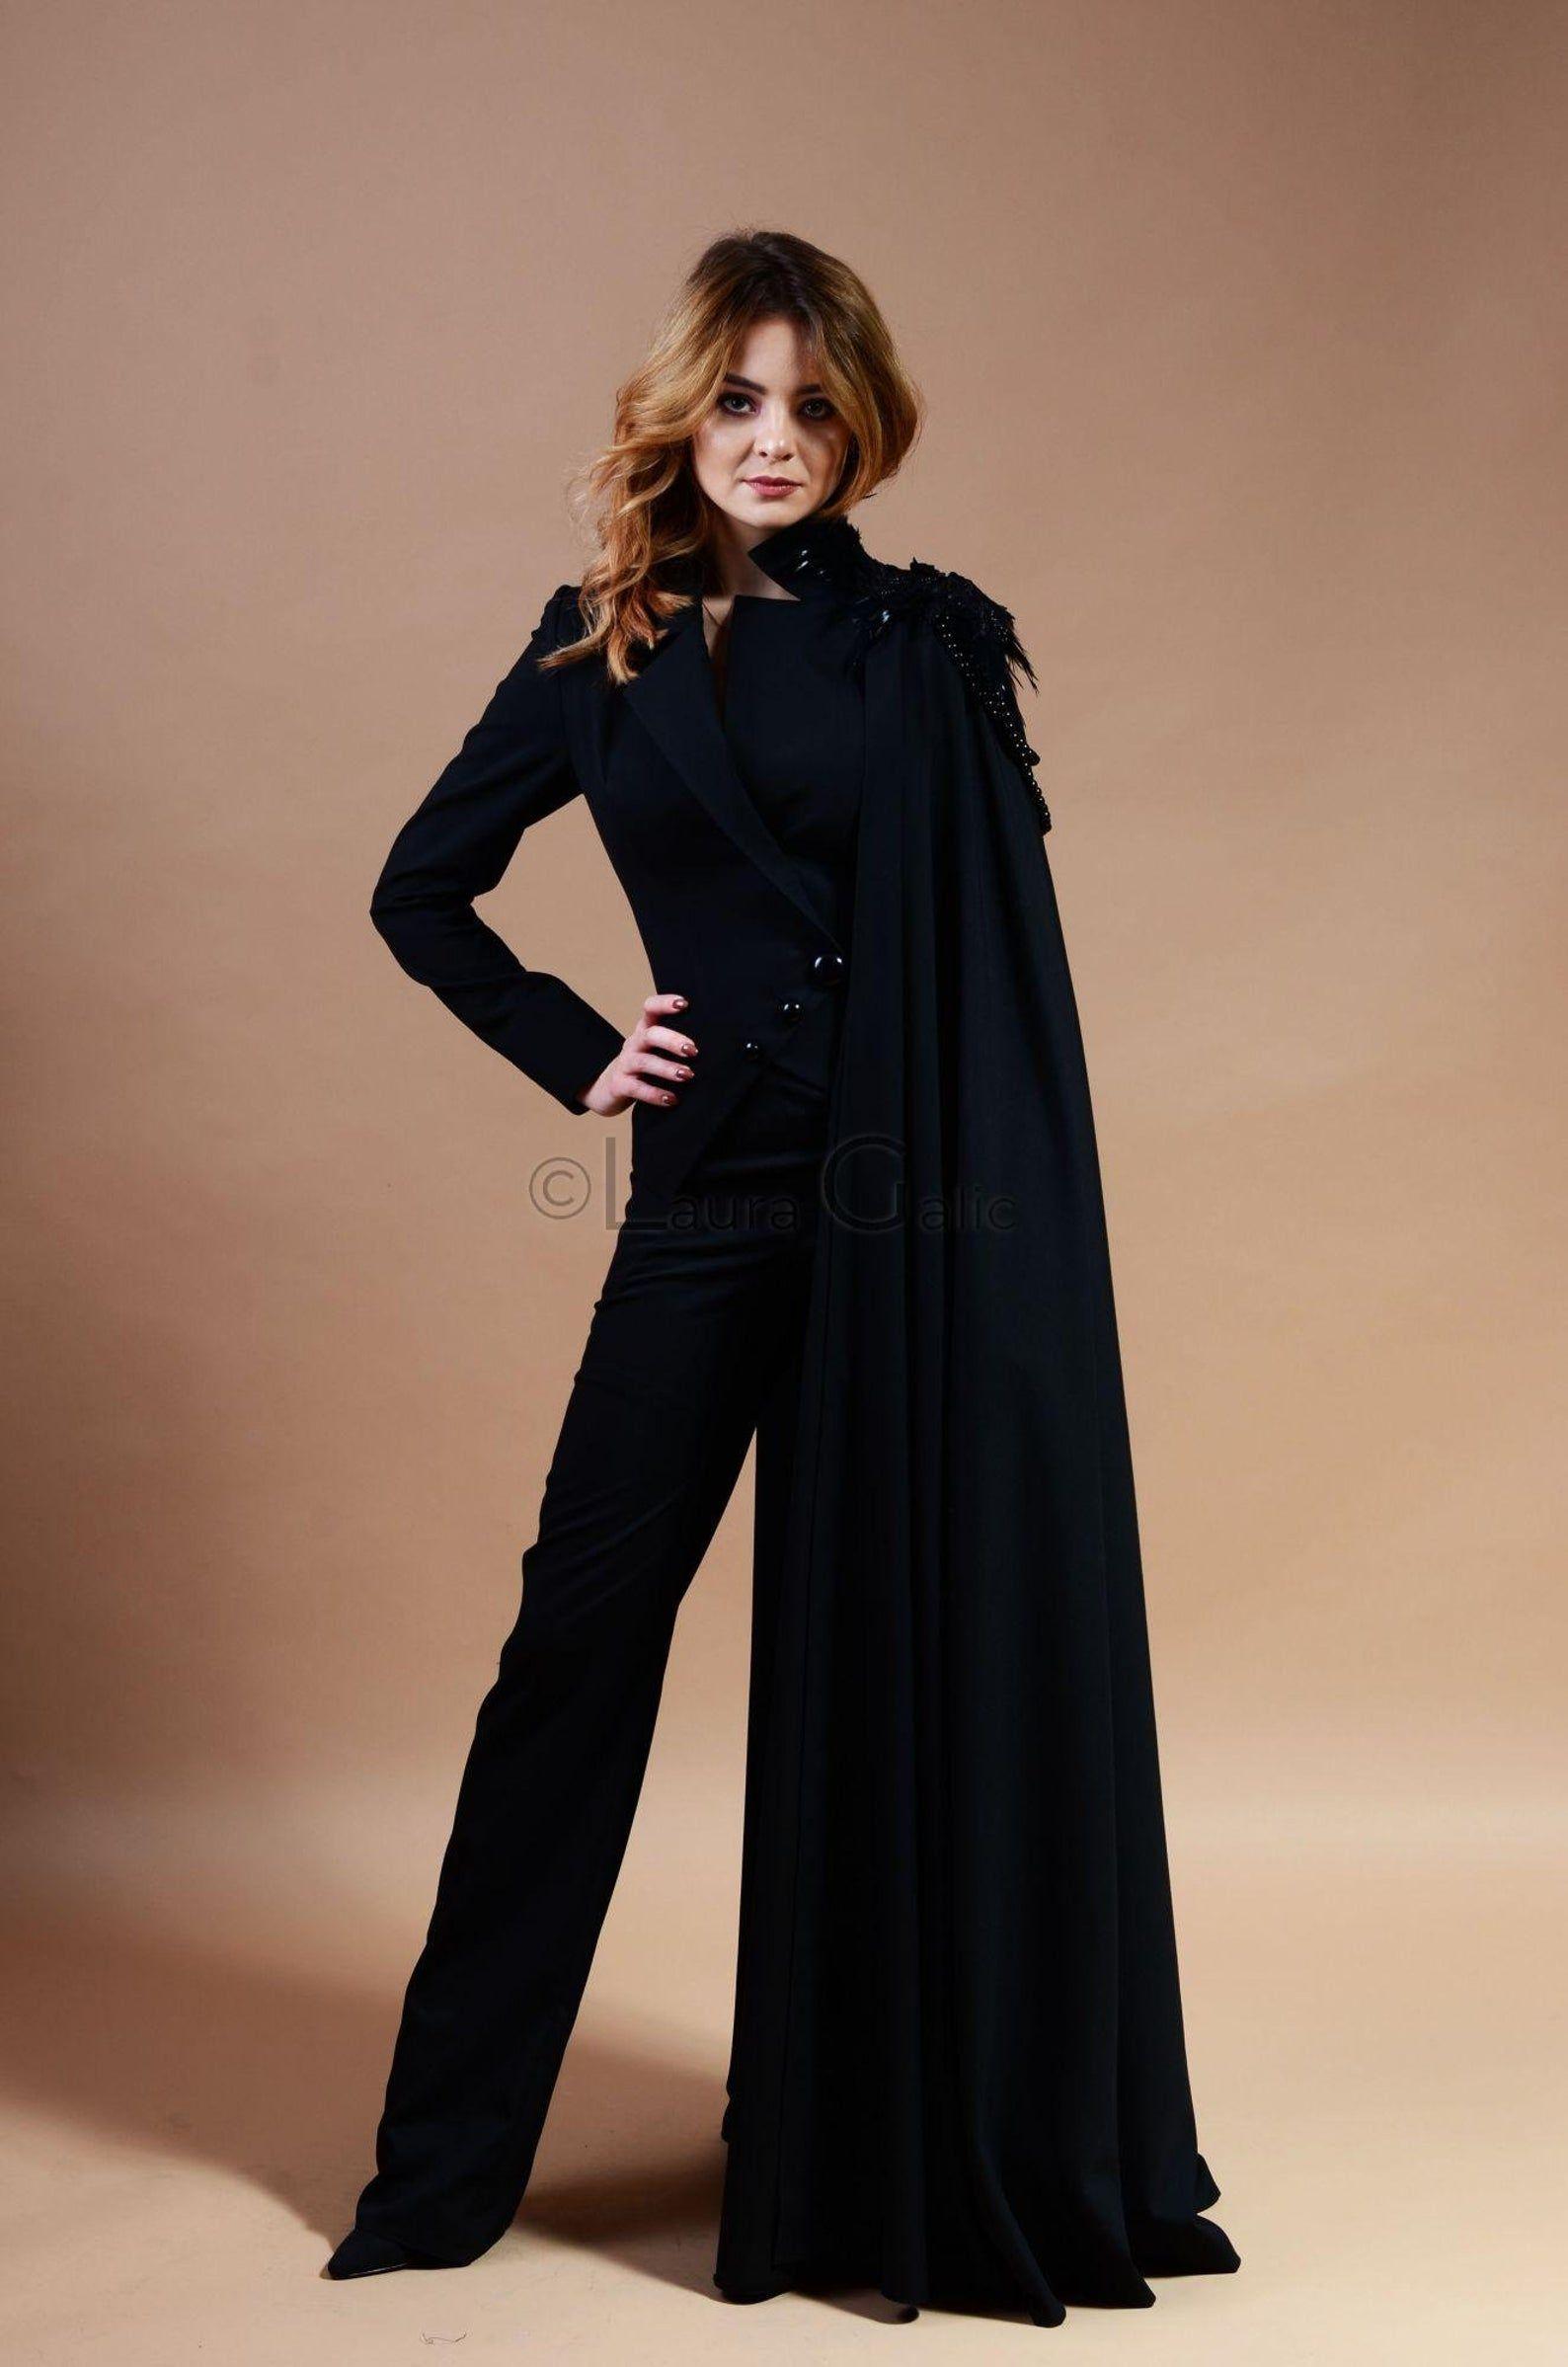 Cape Suit With Feathers Lace And Beads Black Suit For Women Etsy Woman Suit Fashion Black Suit Wedding Tuxedo Women [ 2397 x 1588 Pixel ]